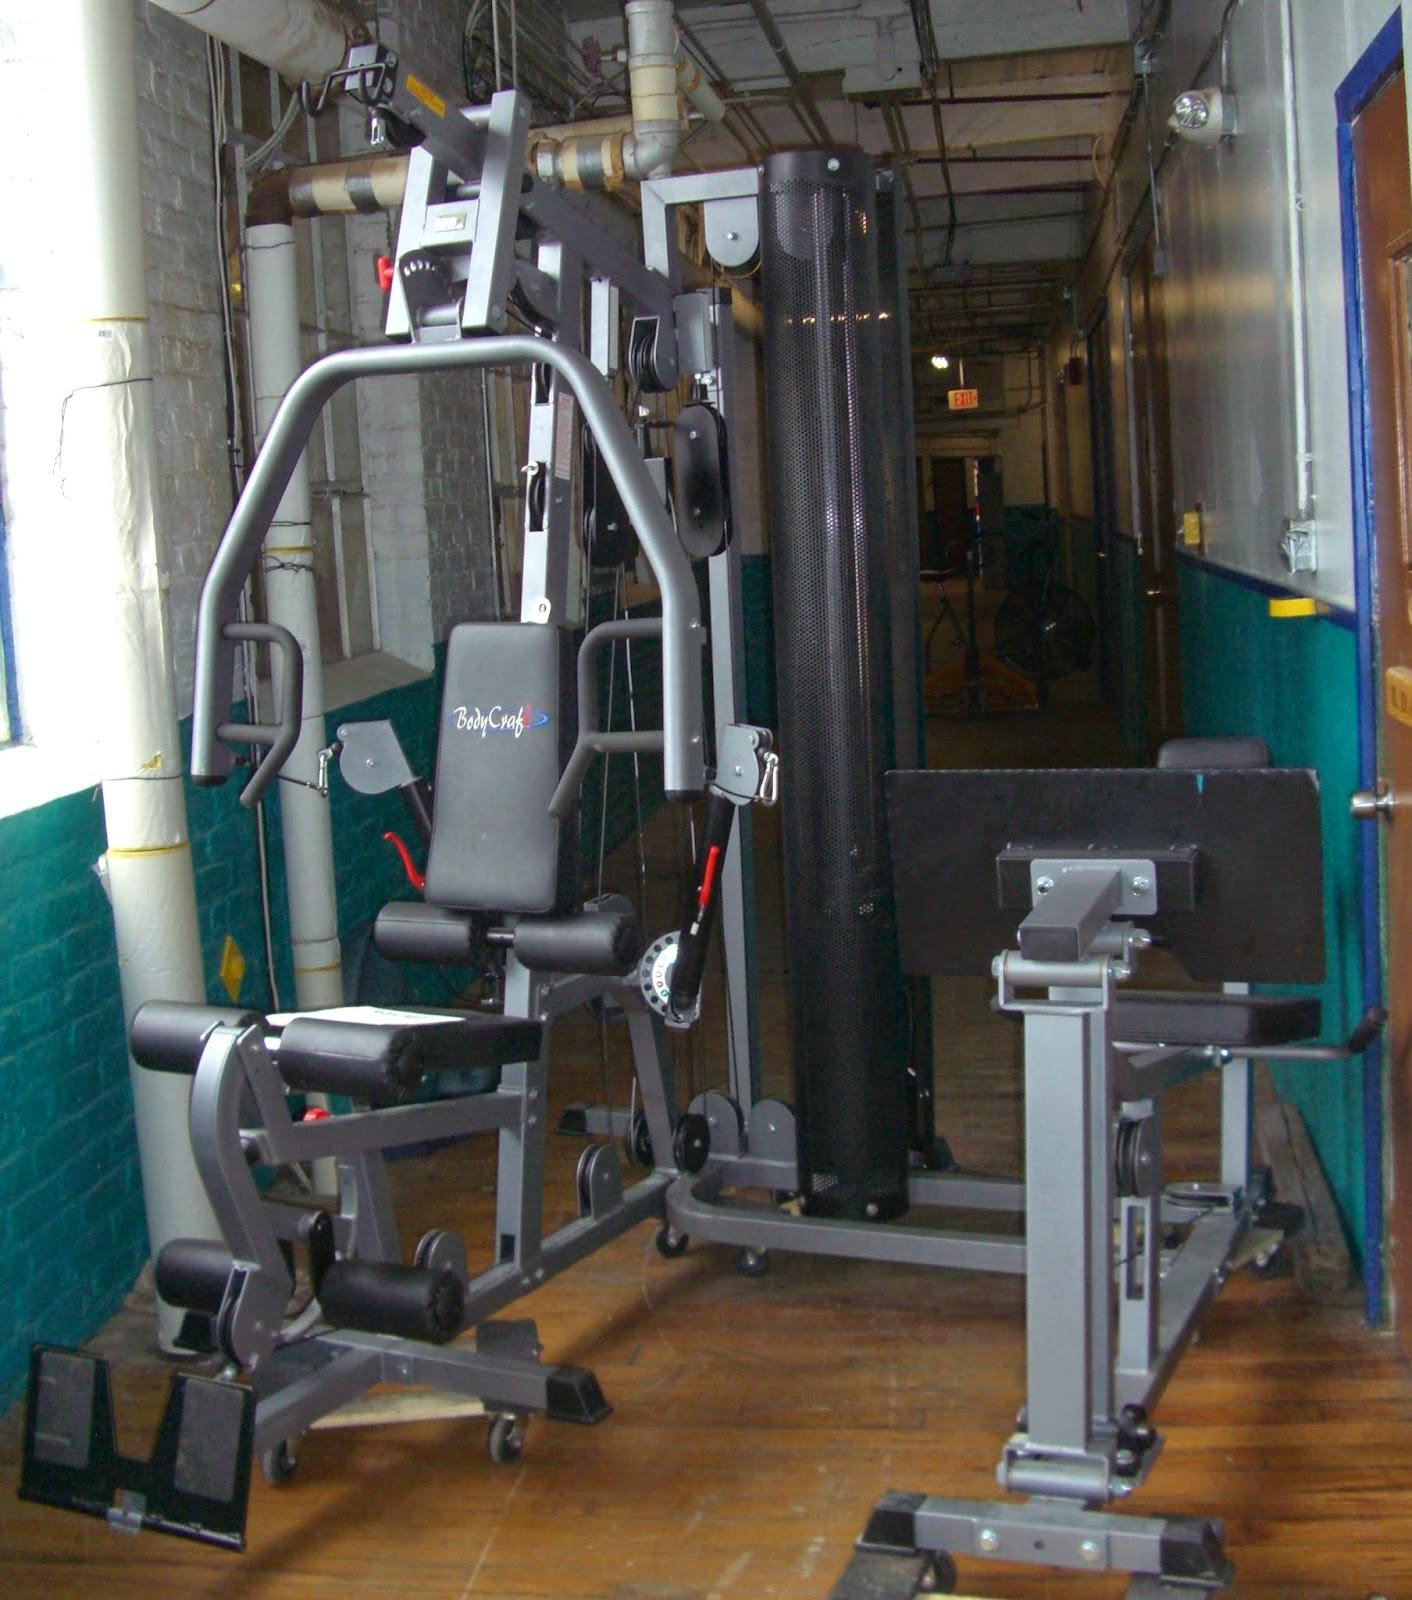 bodycraft xpress pro strength training system. Black Bedroom Furniture Sets. Home Design Ideas